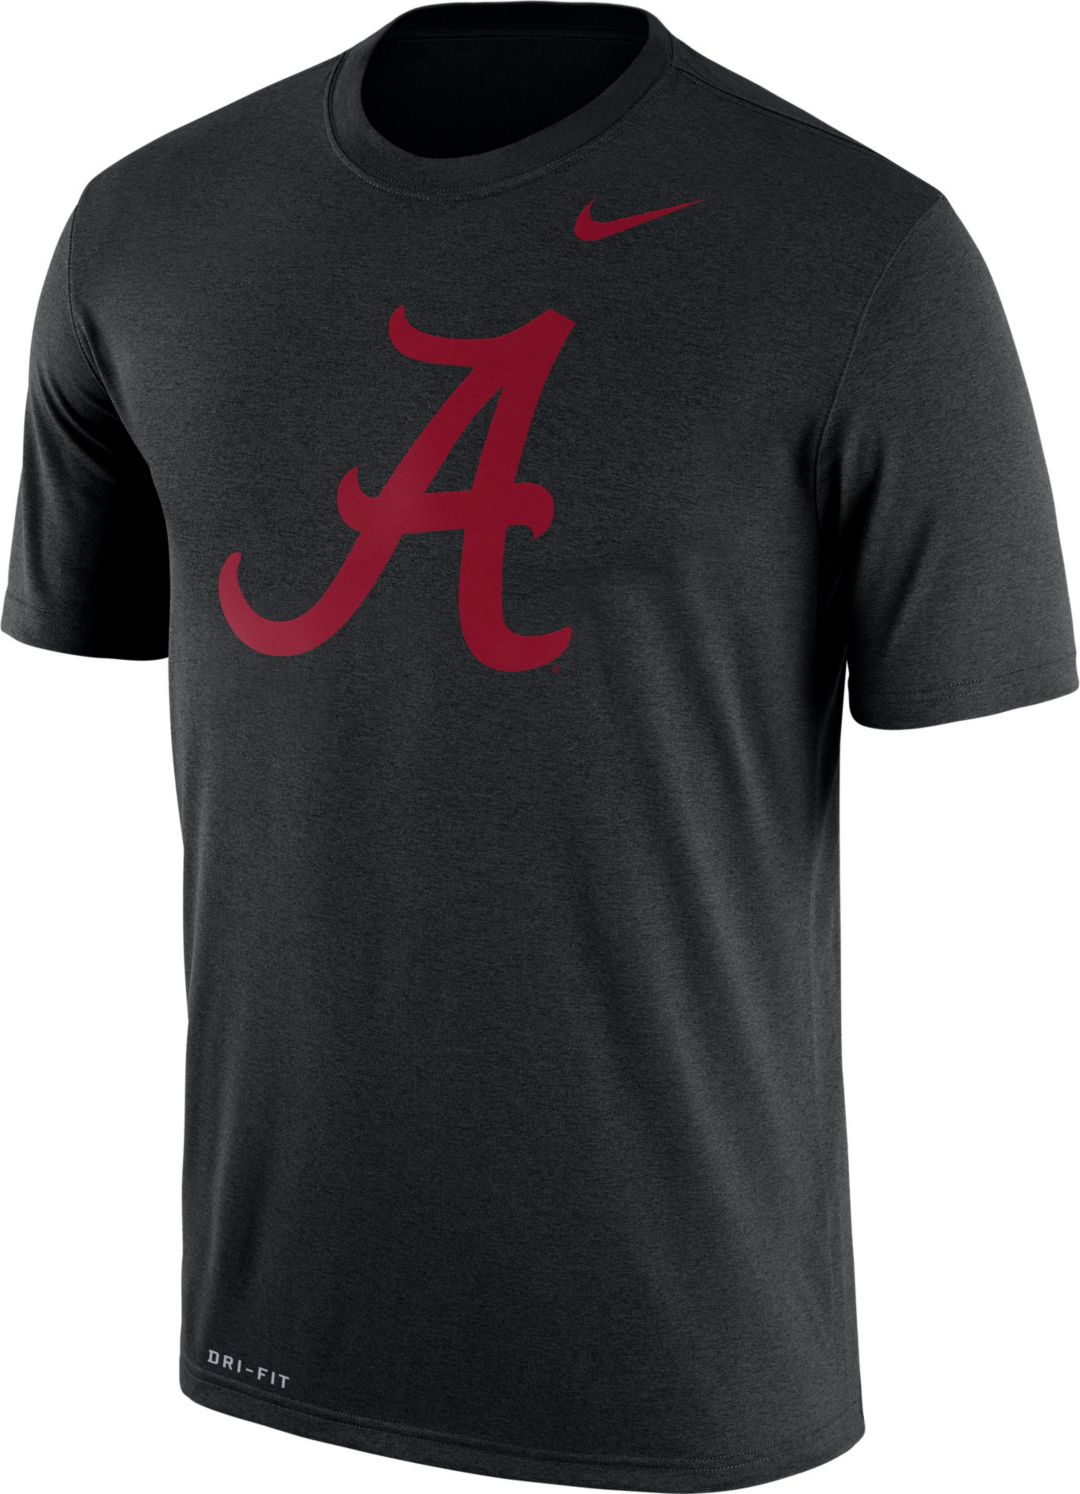 5082fc392c9e Nike Men s Alabama Crimson Tide Black Logo Dry Legend T-Shirt ...